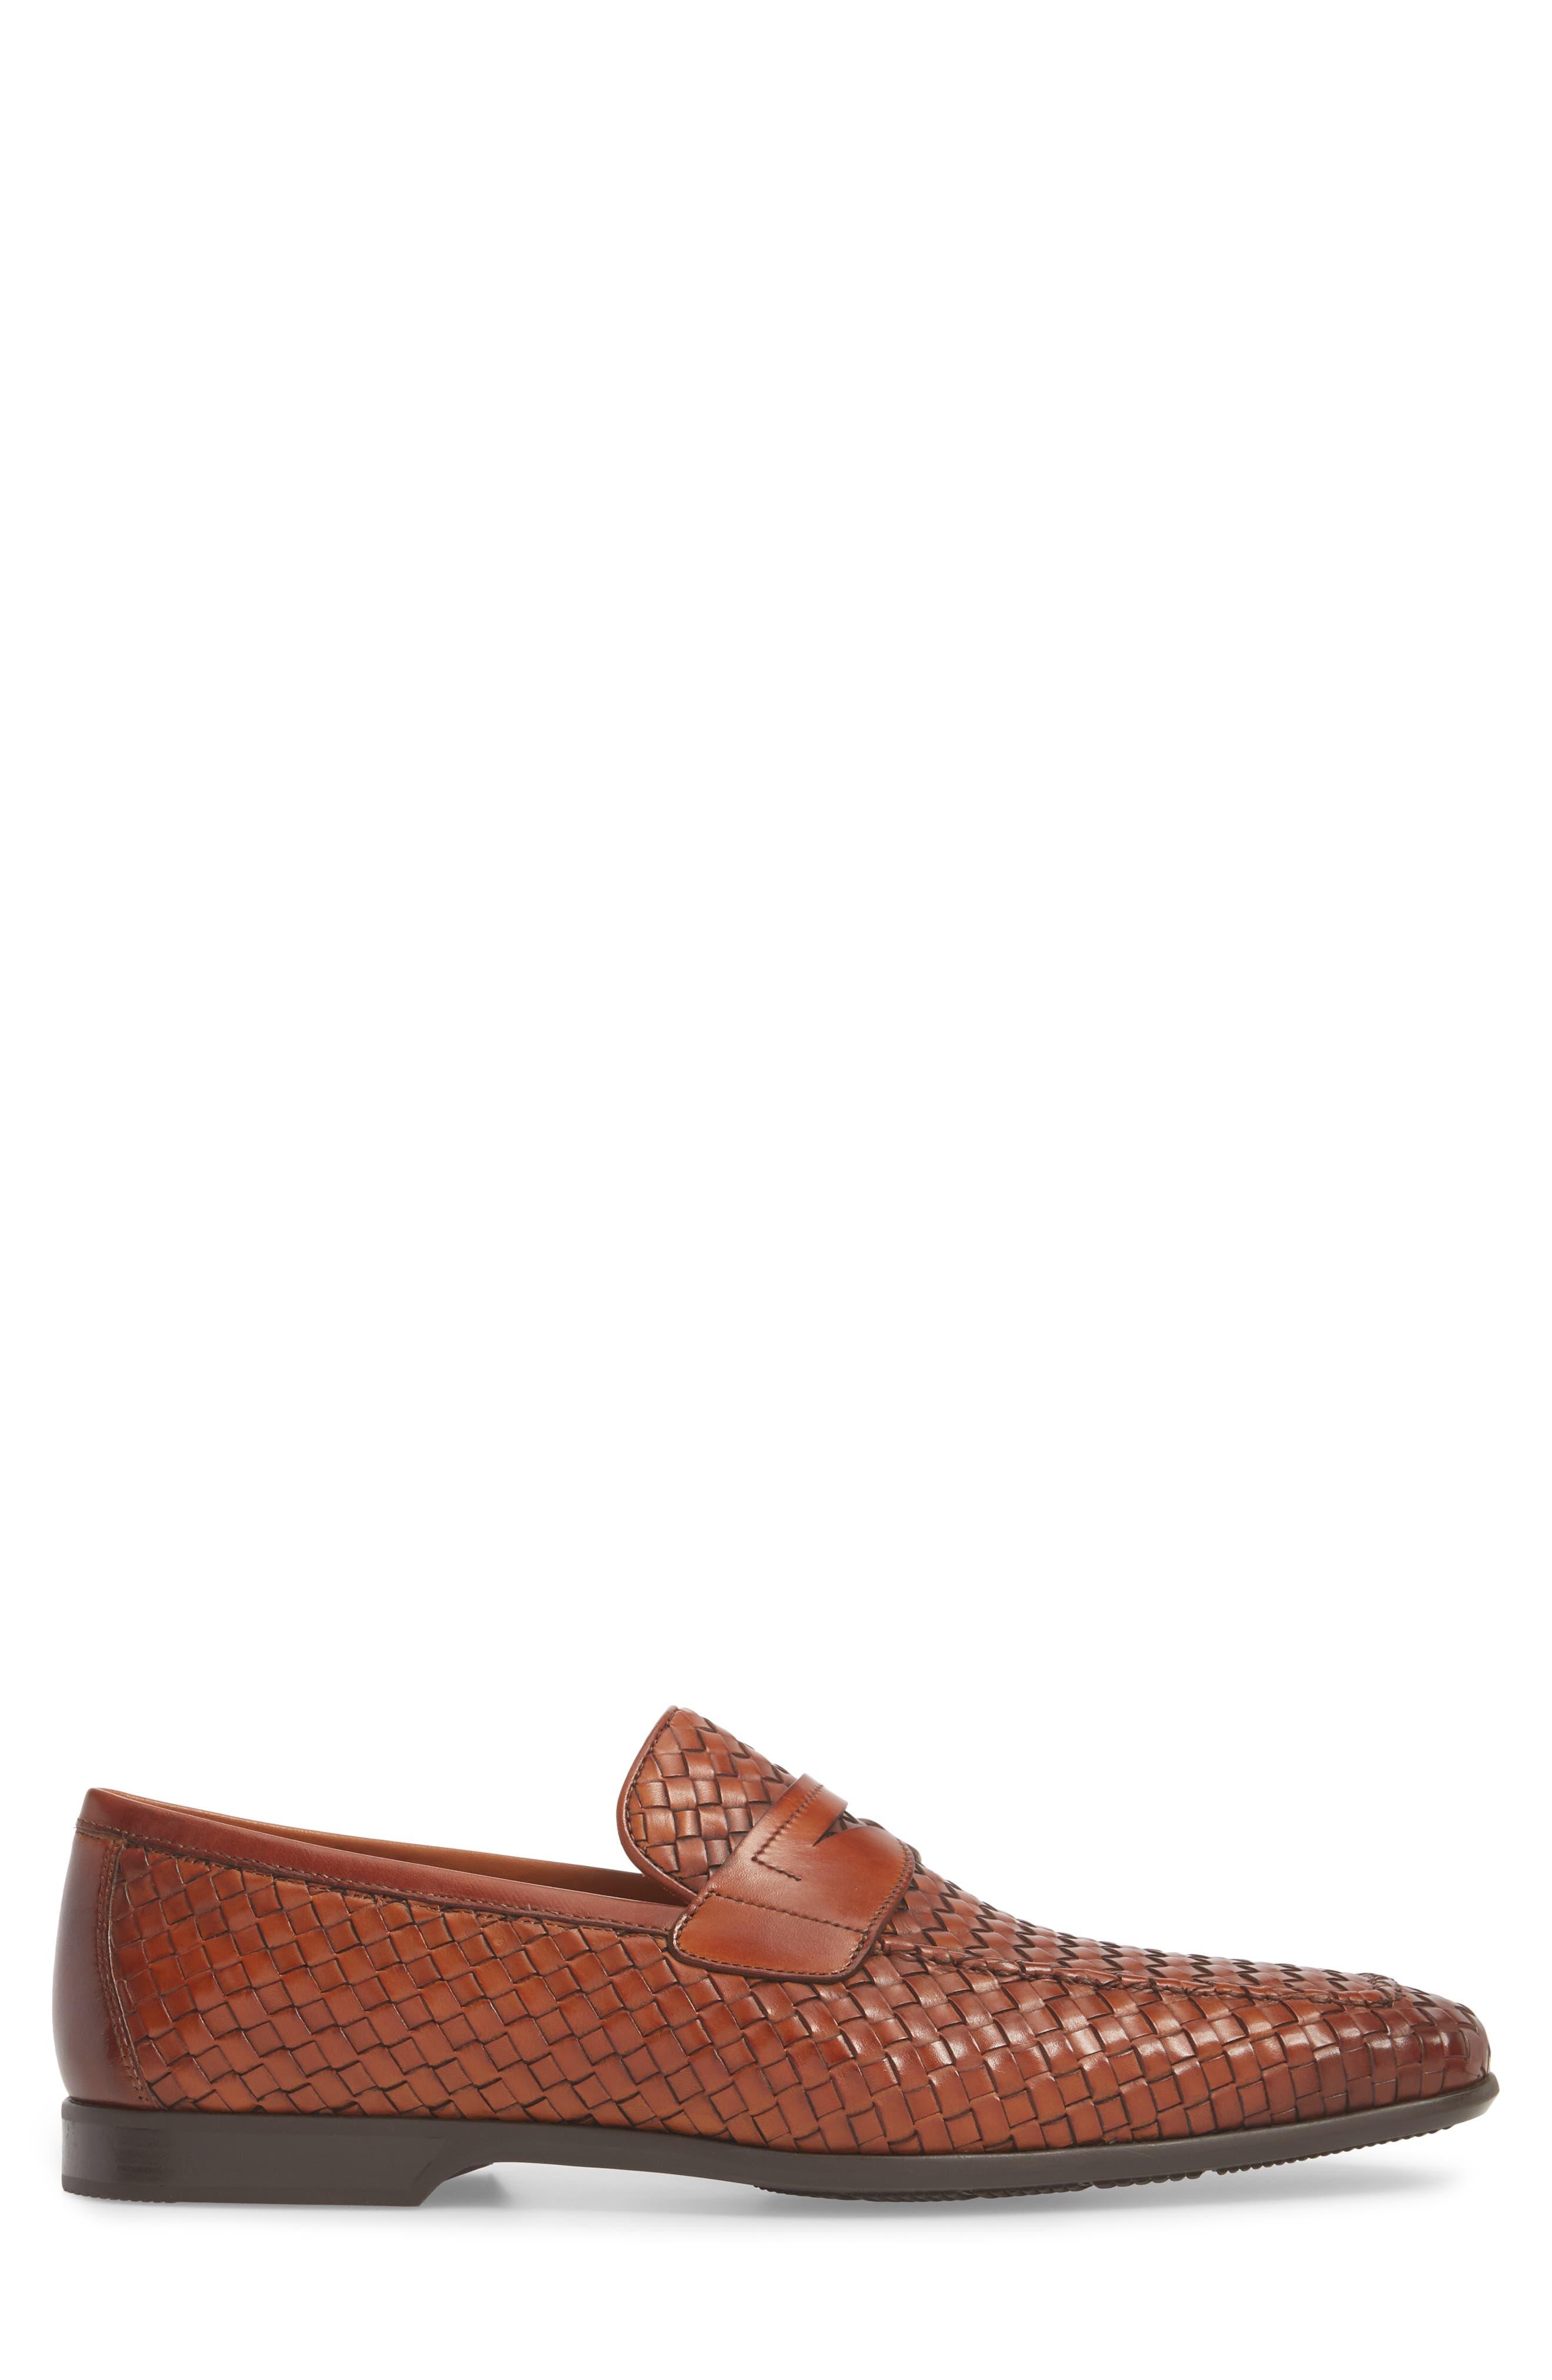 Rafa II Woven Penny Loafer,                             Alternate thumbnail 3, color,                             Cognac Leather